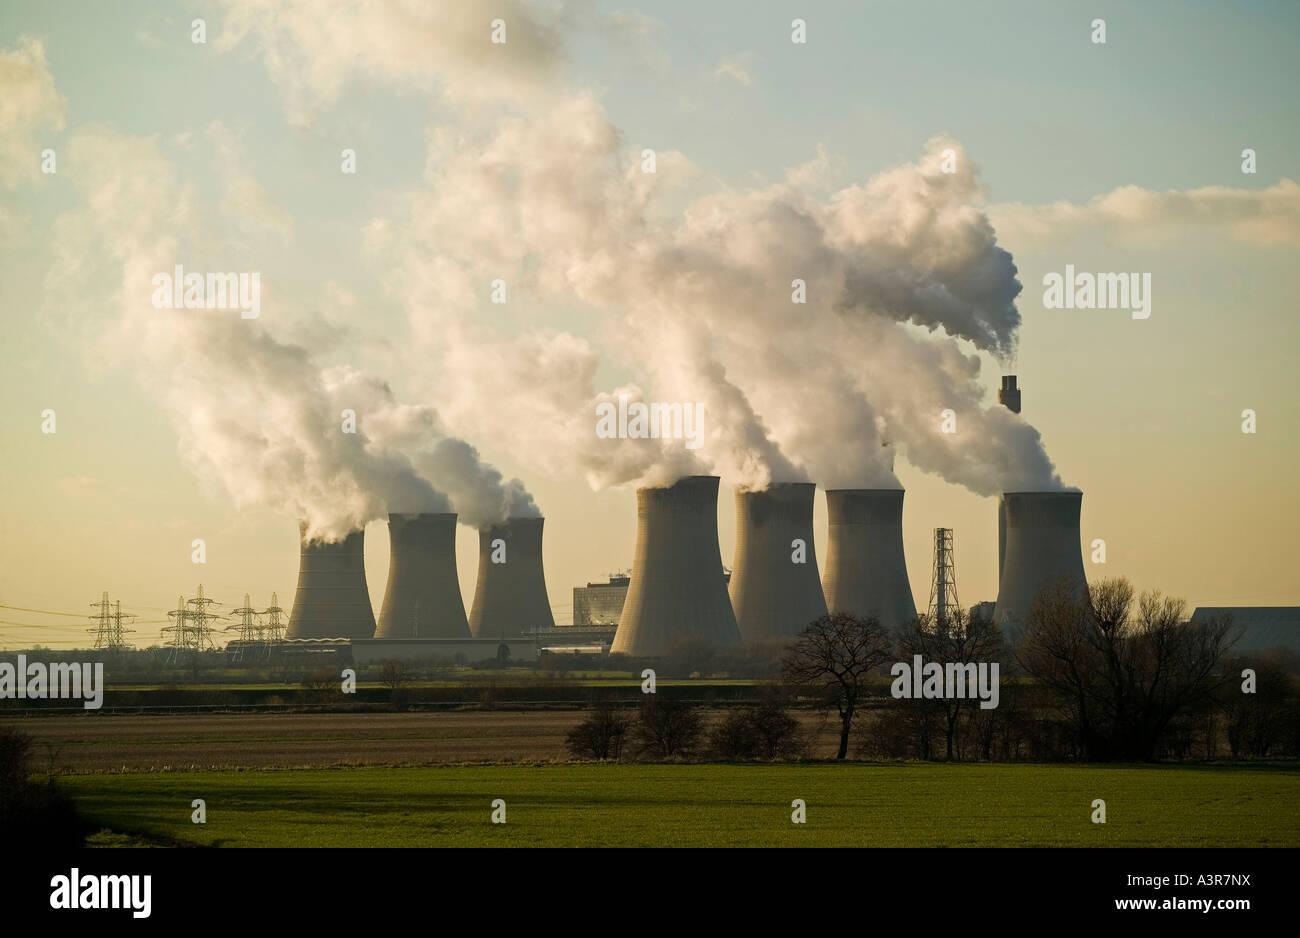 cottam power station - Stock Image